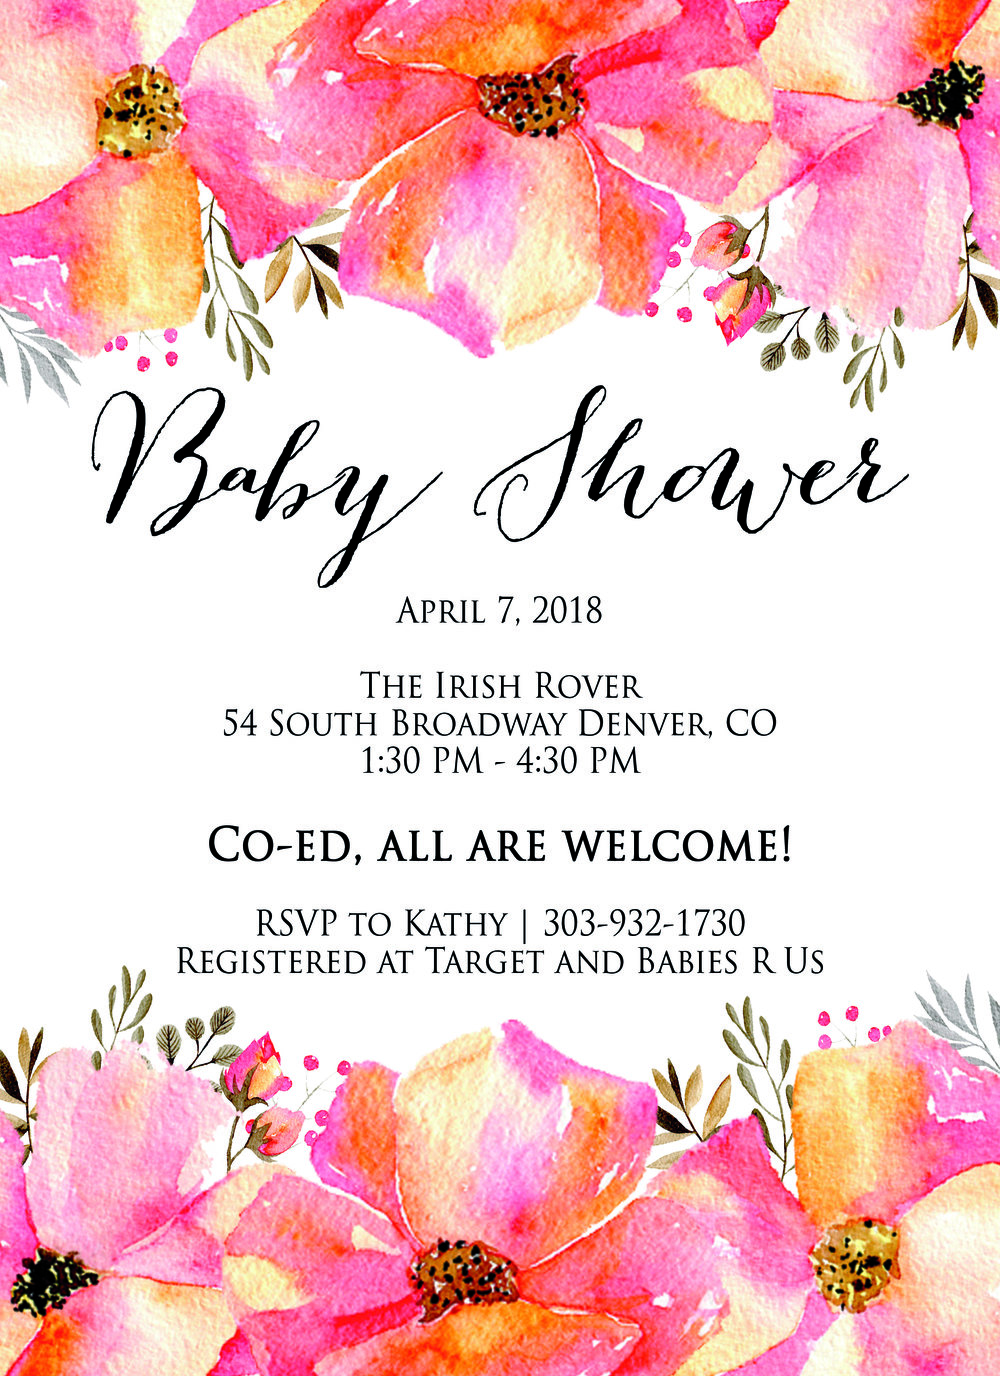 Hellner Baby Shower Front.jpg